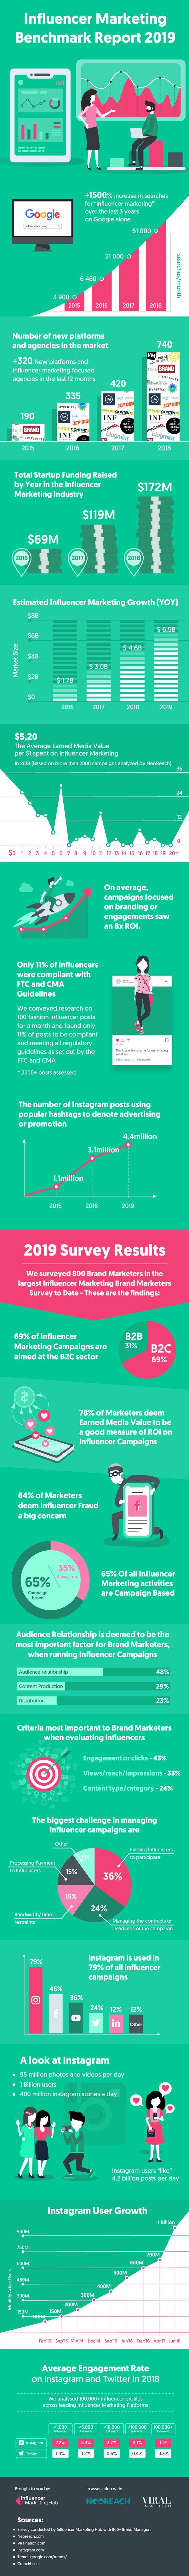 Influencer-Marketing-Benchmark-Report-2019-1